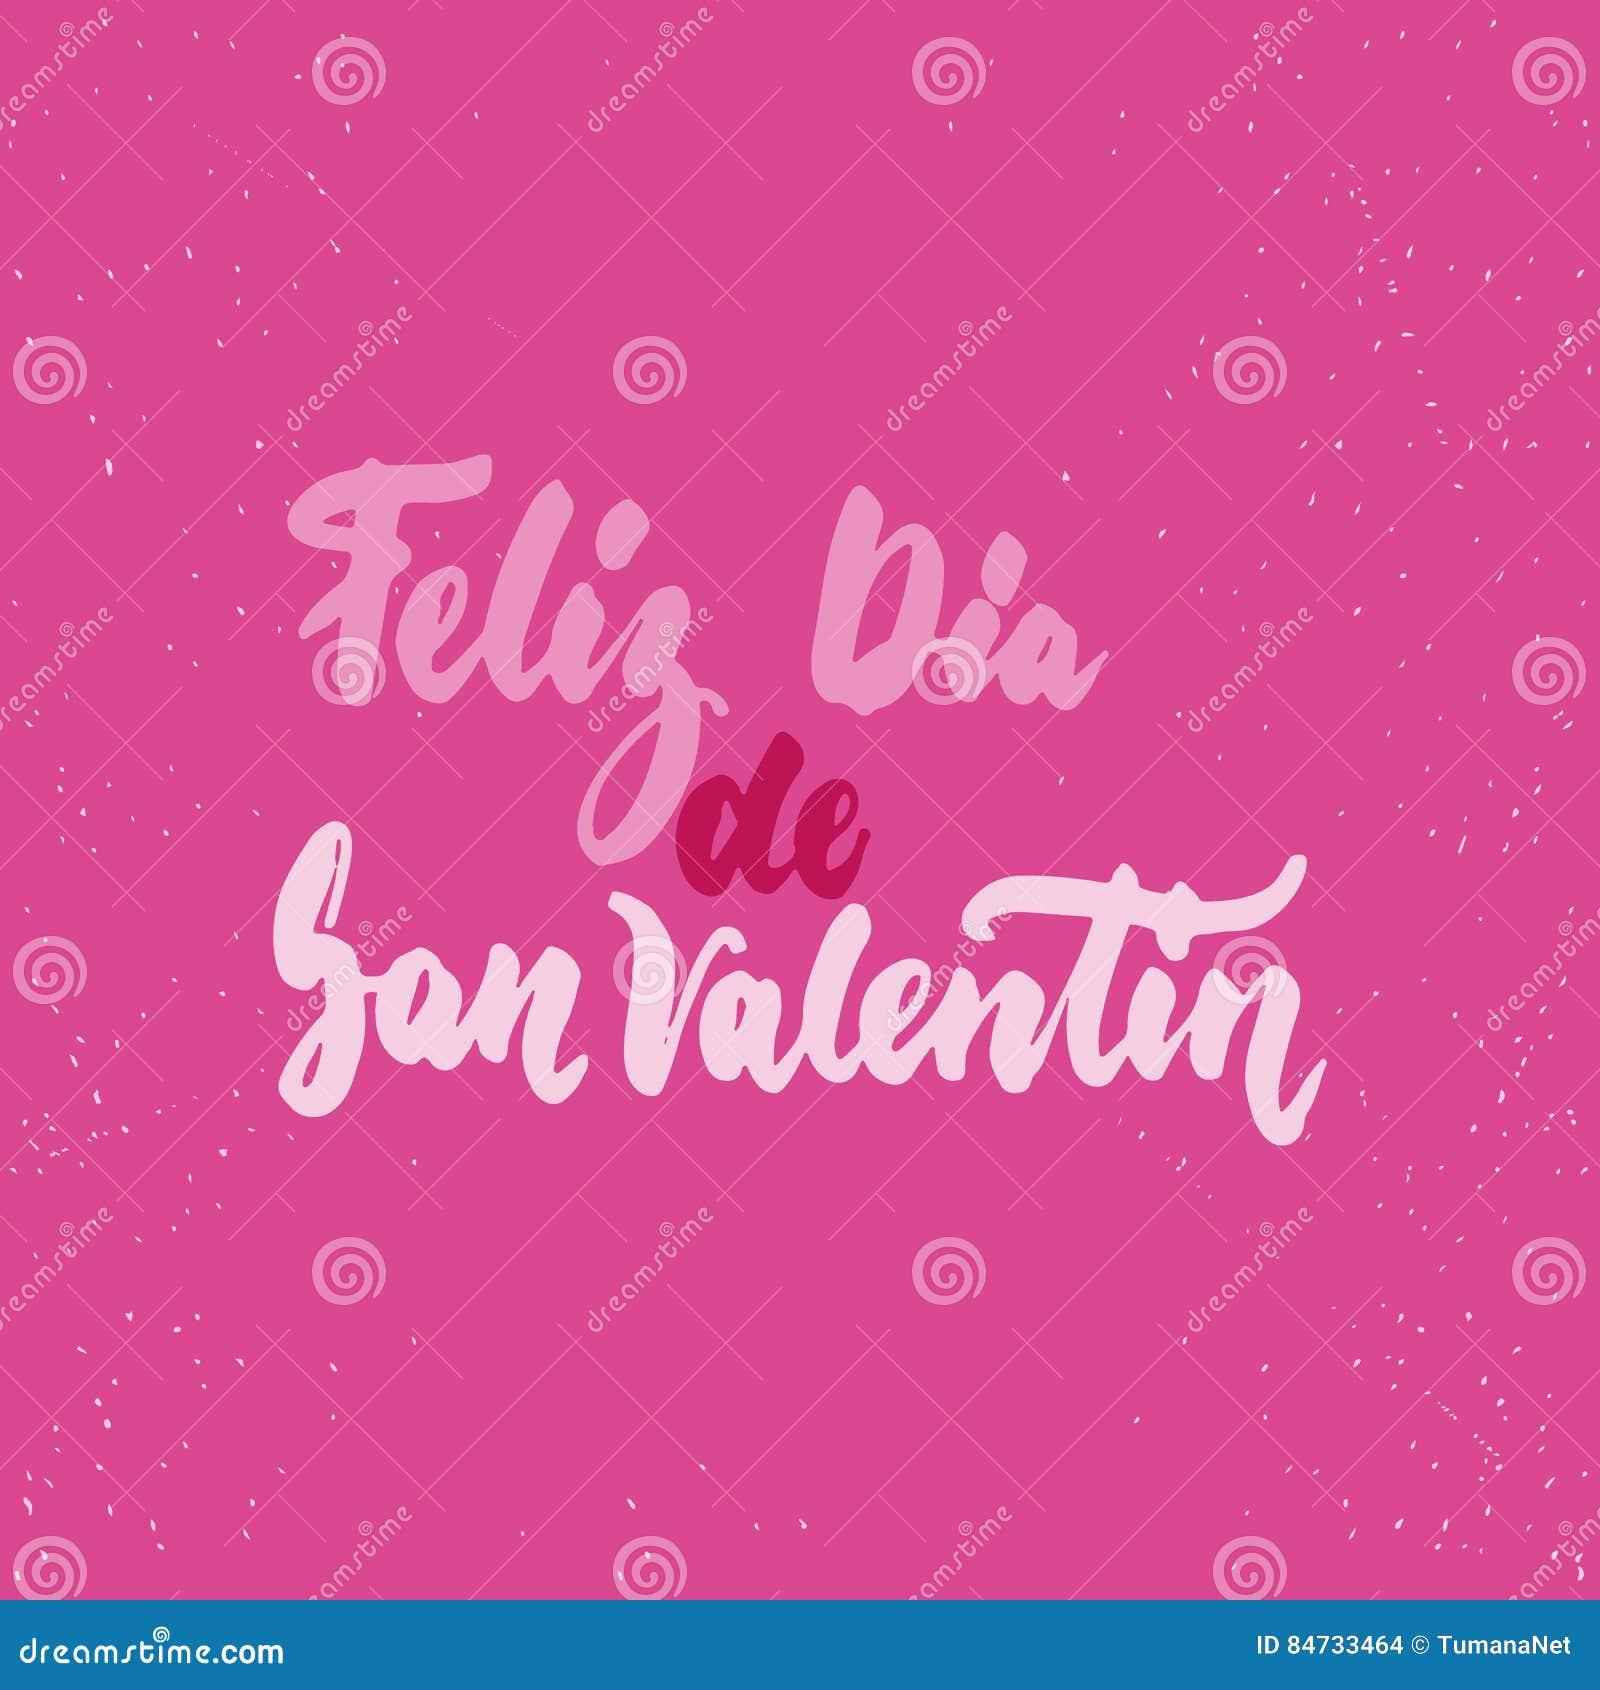 Feliz Dia De San Valentin What Means Happy Valentines Day Spanish